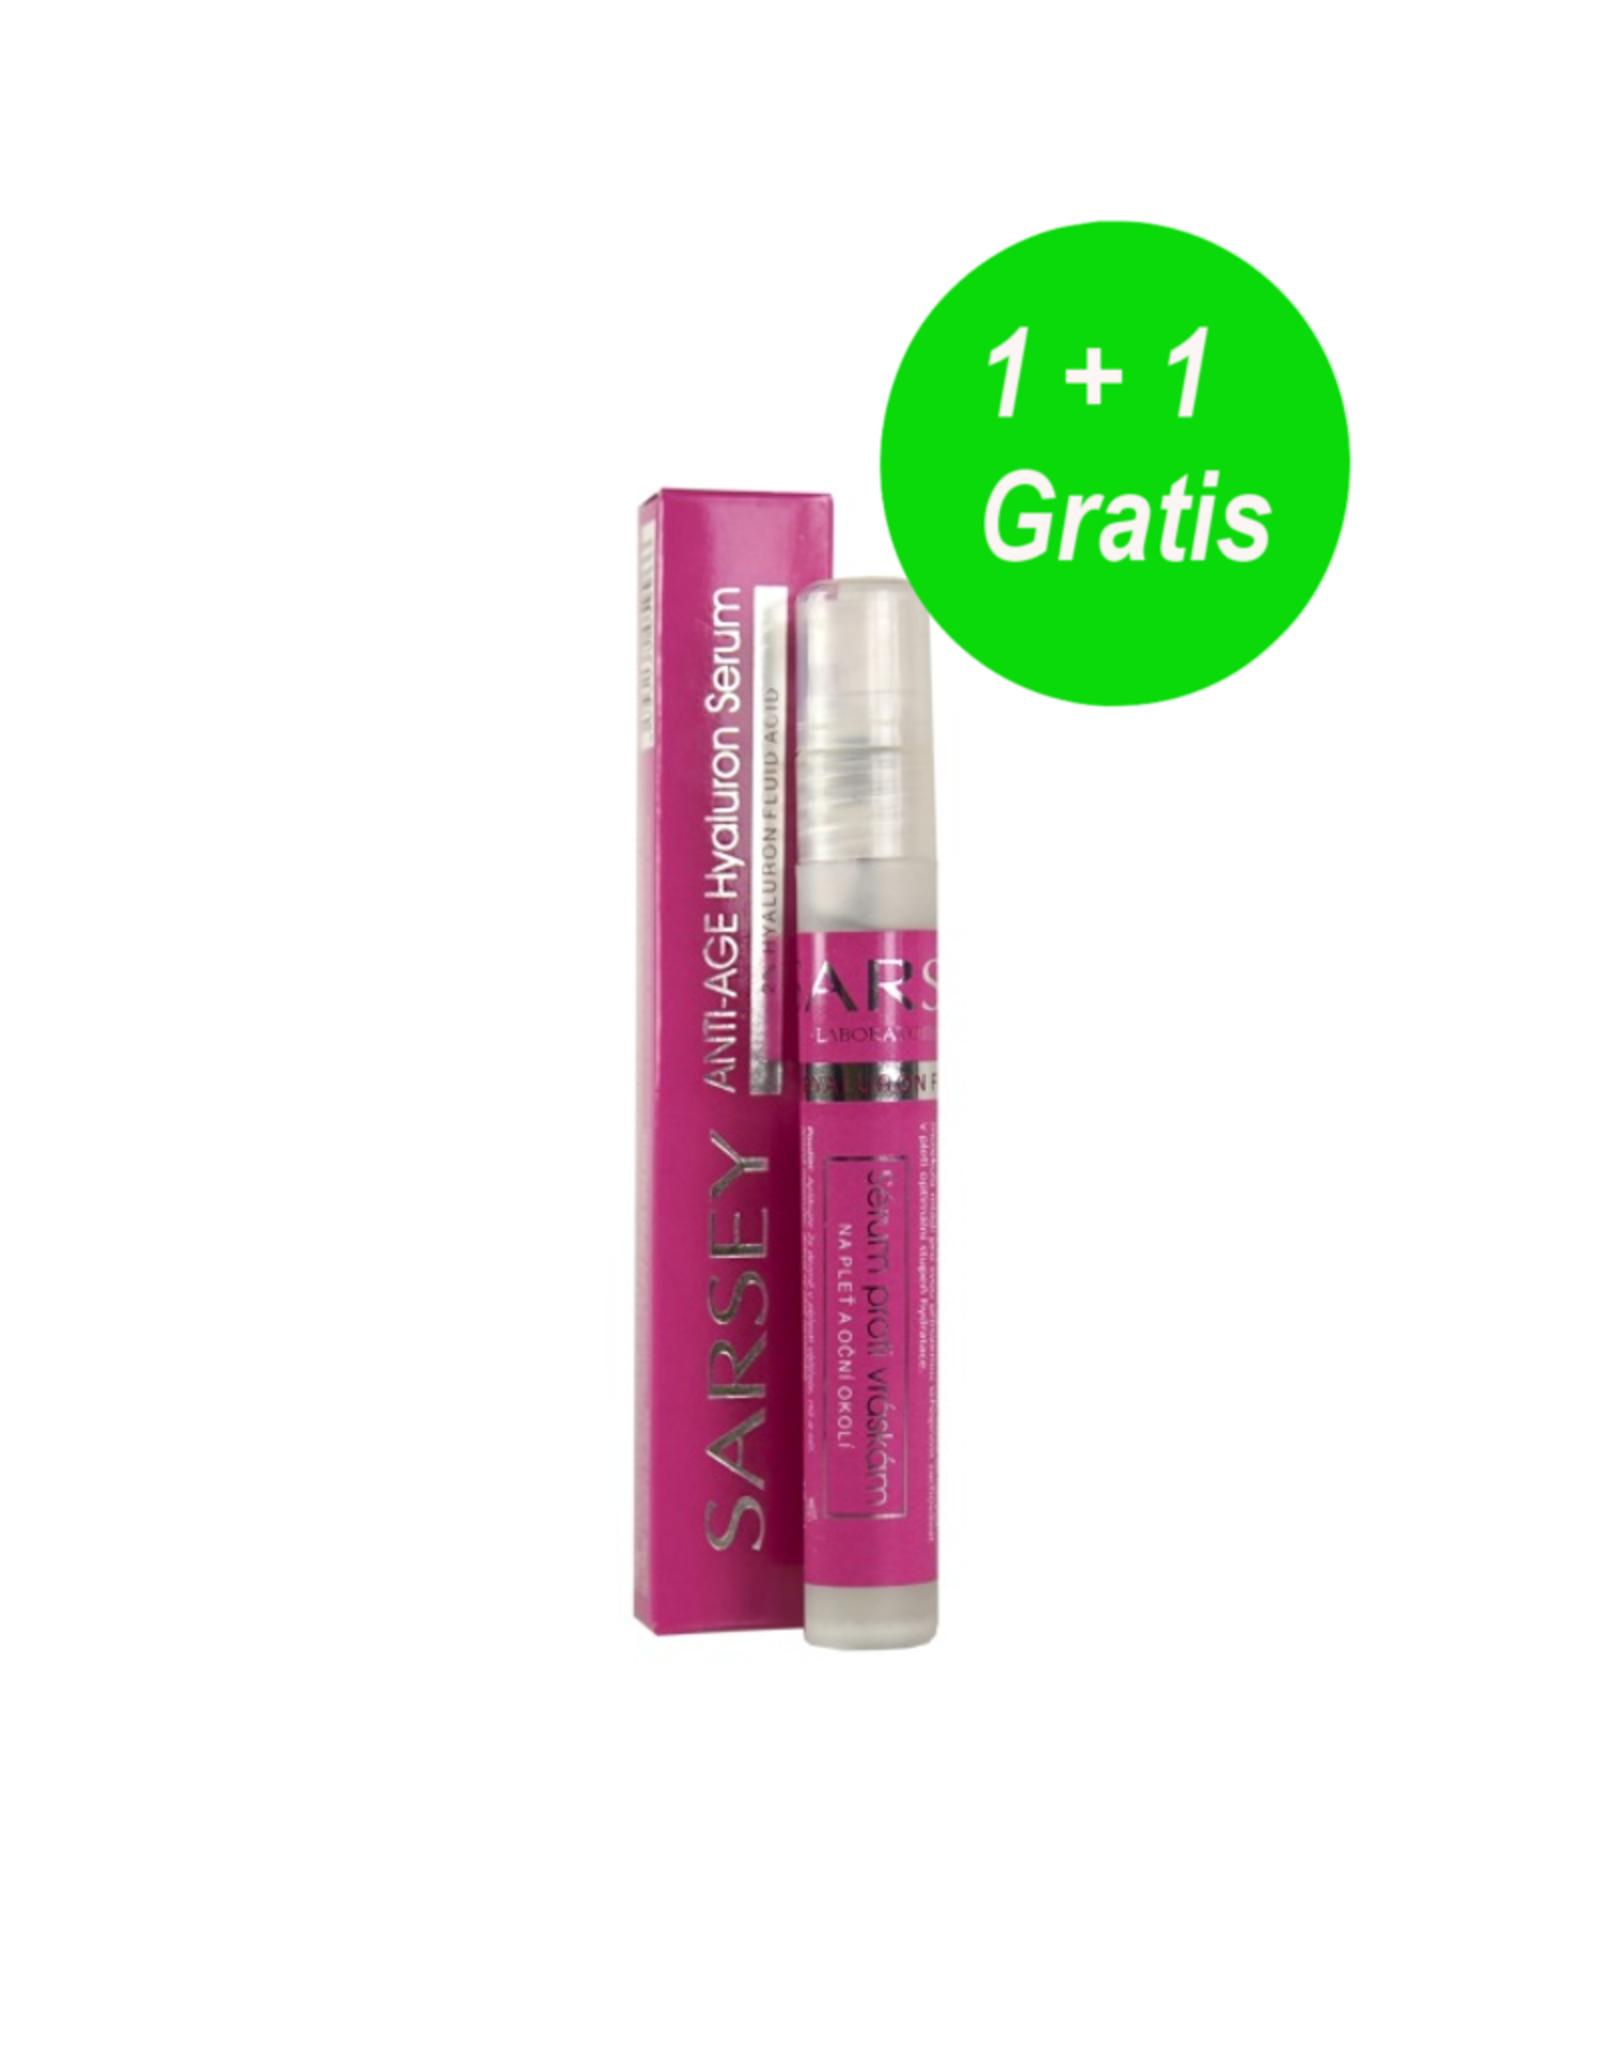 SARSEY Liftende Anti-Ageing Serum (kleine verpakking) 1 + 1 GRATIS  - Copy